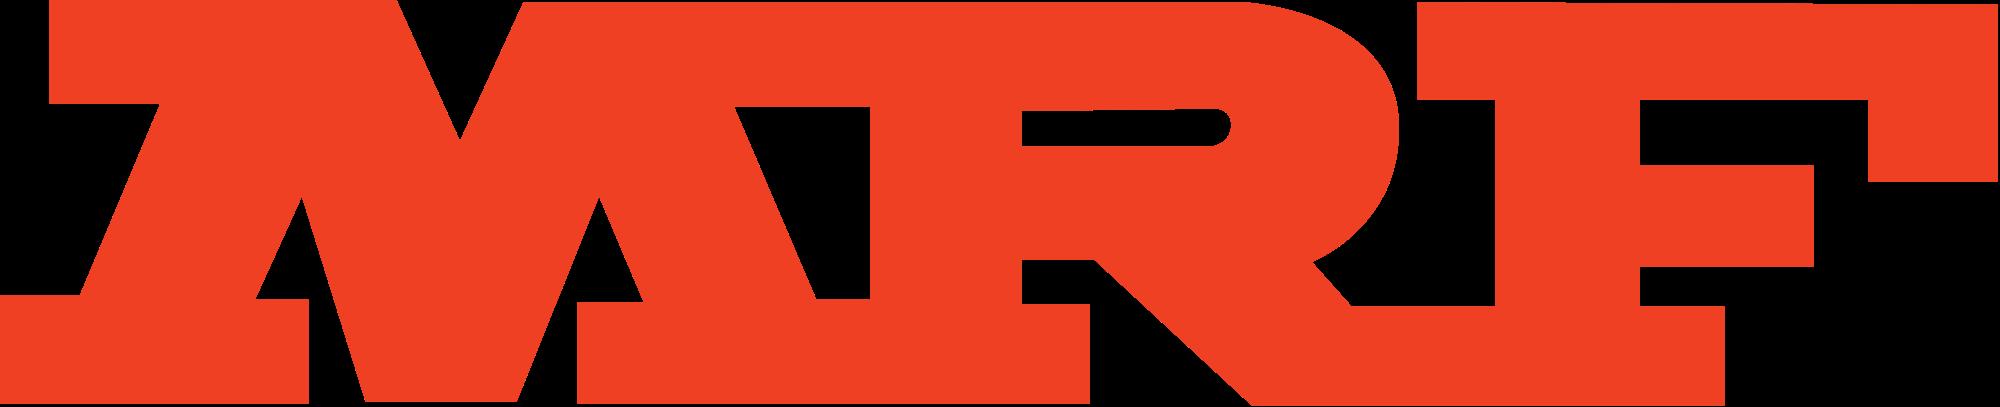 Mrf logo clipart clip Mrf tyres logo png 3 » PNG Image clip